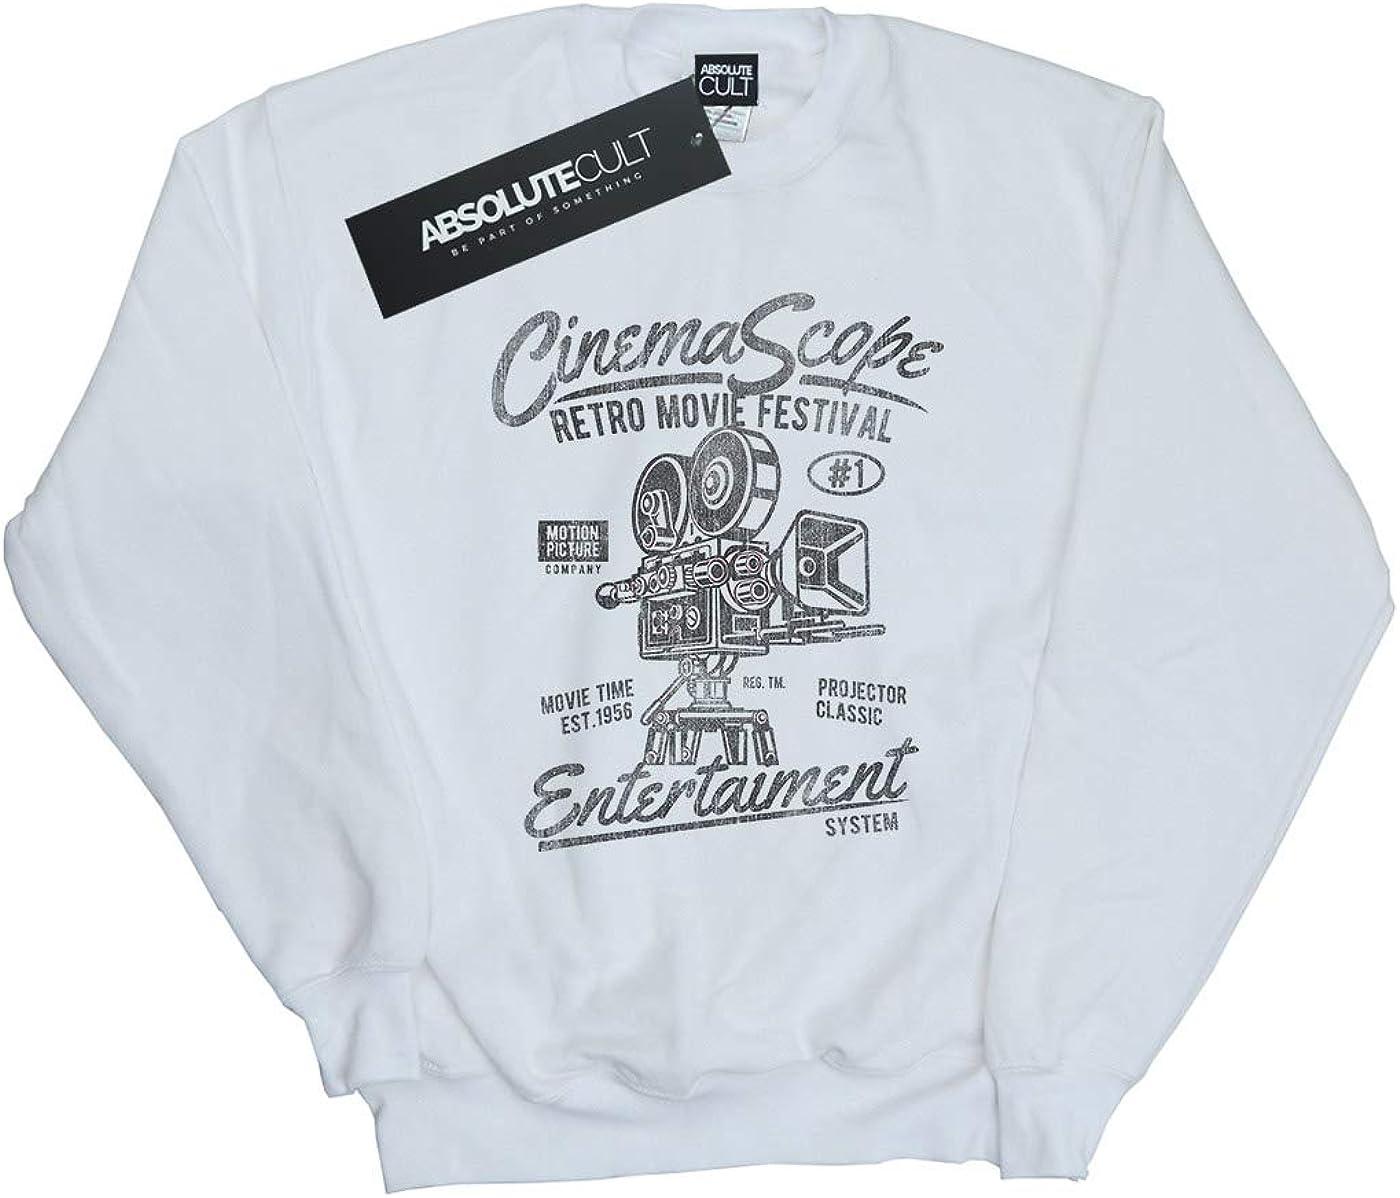 Absolute Cult Drewbacca Girls Cinema Scope Sweatshirt